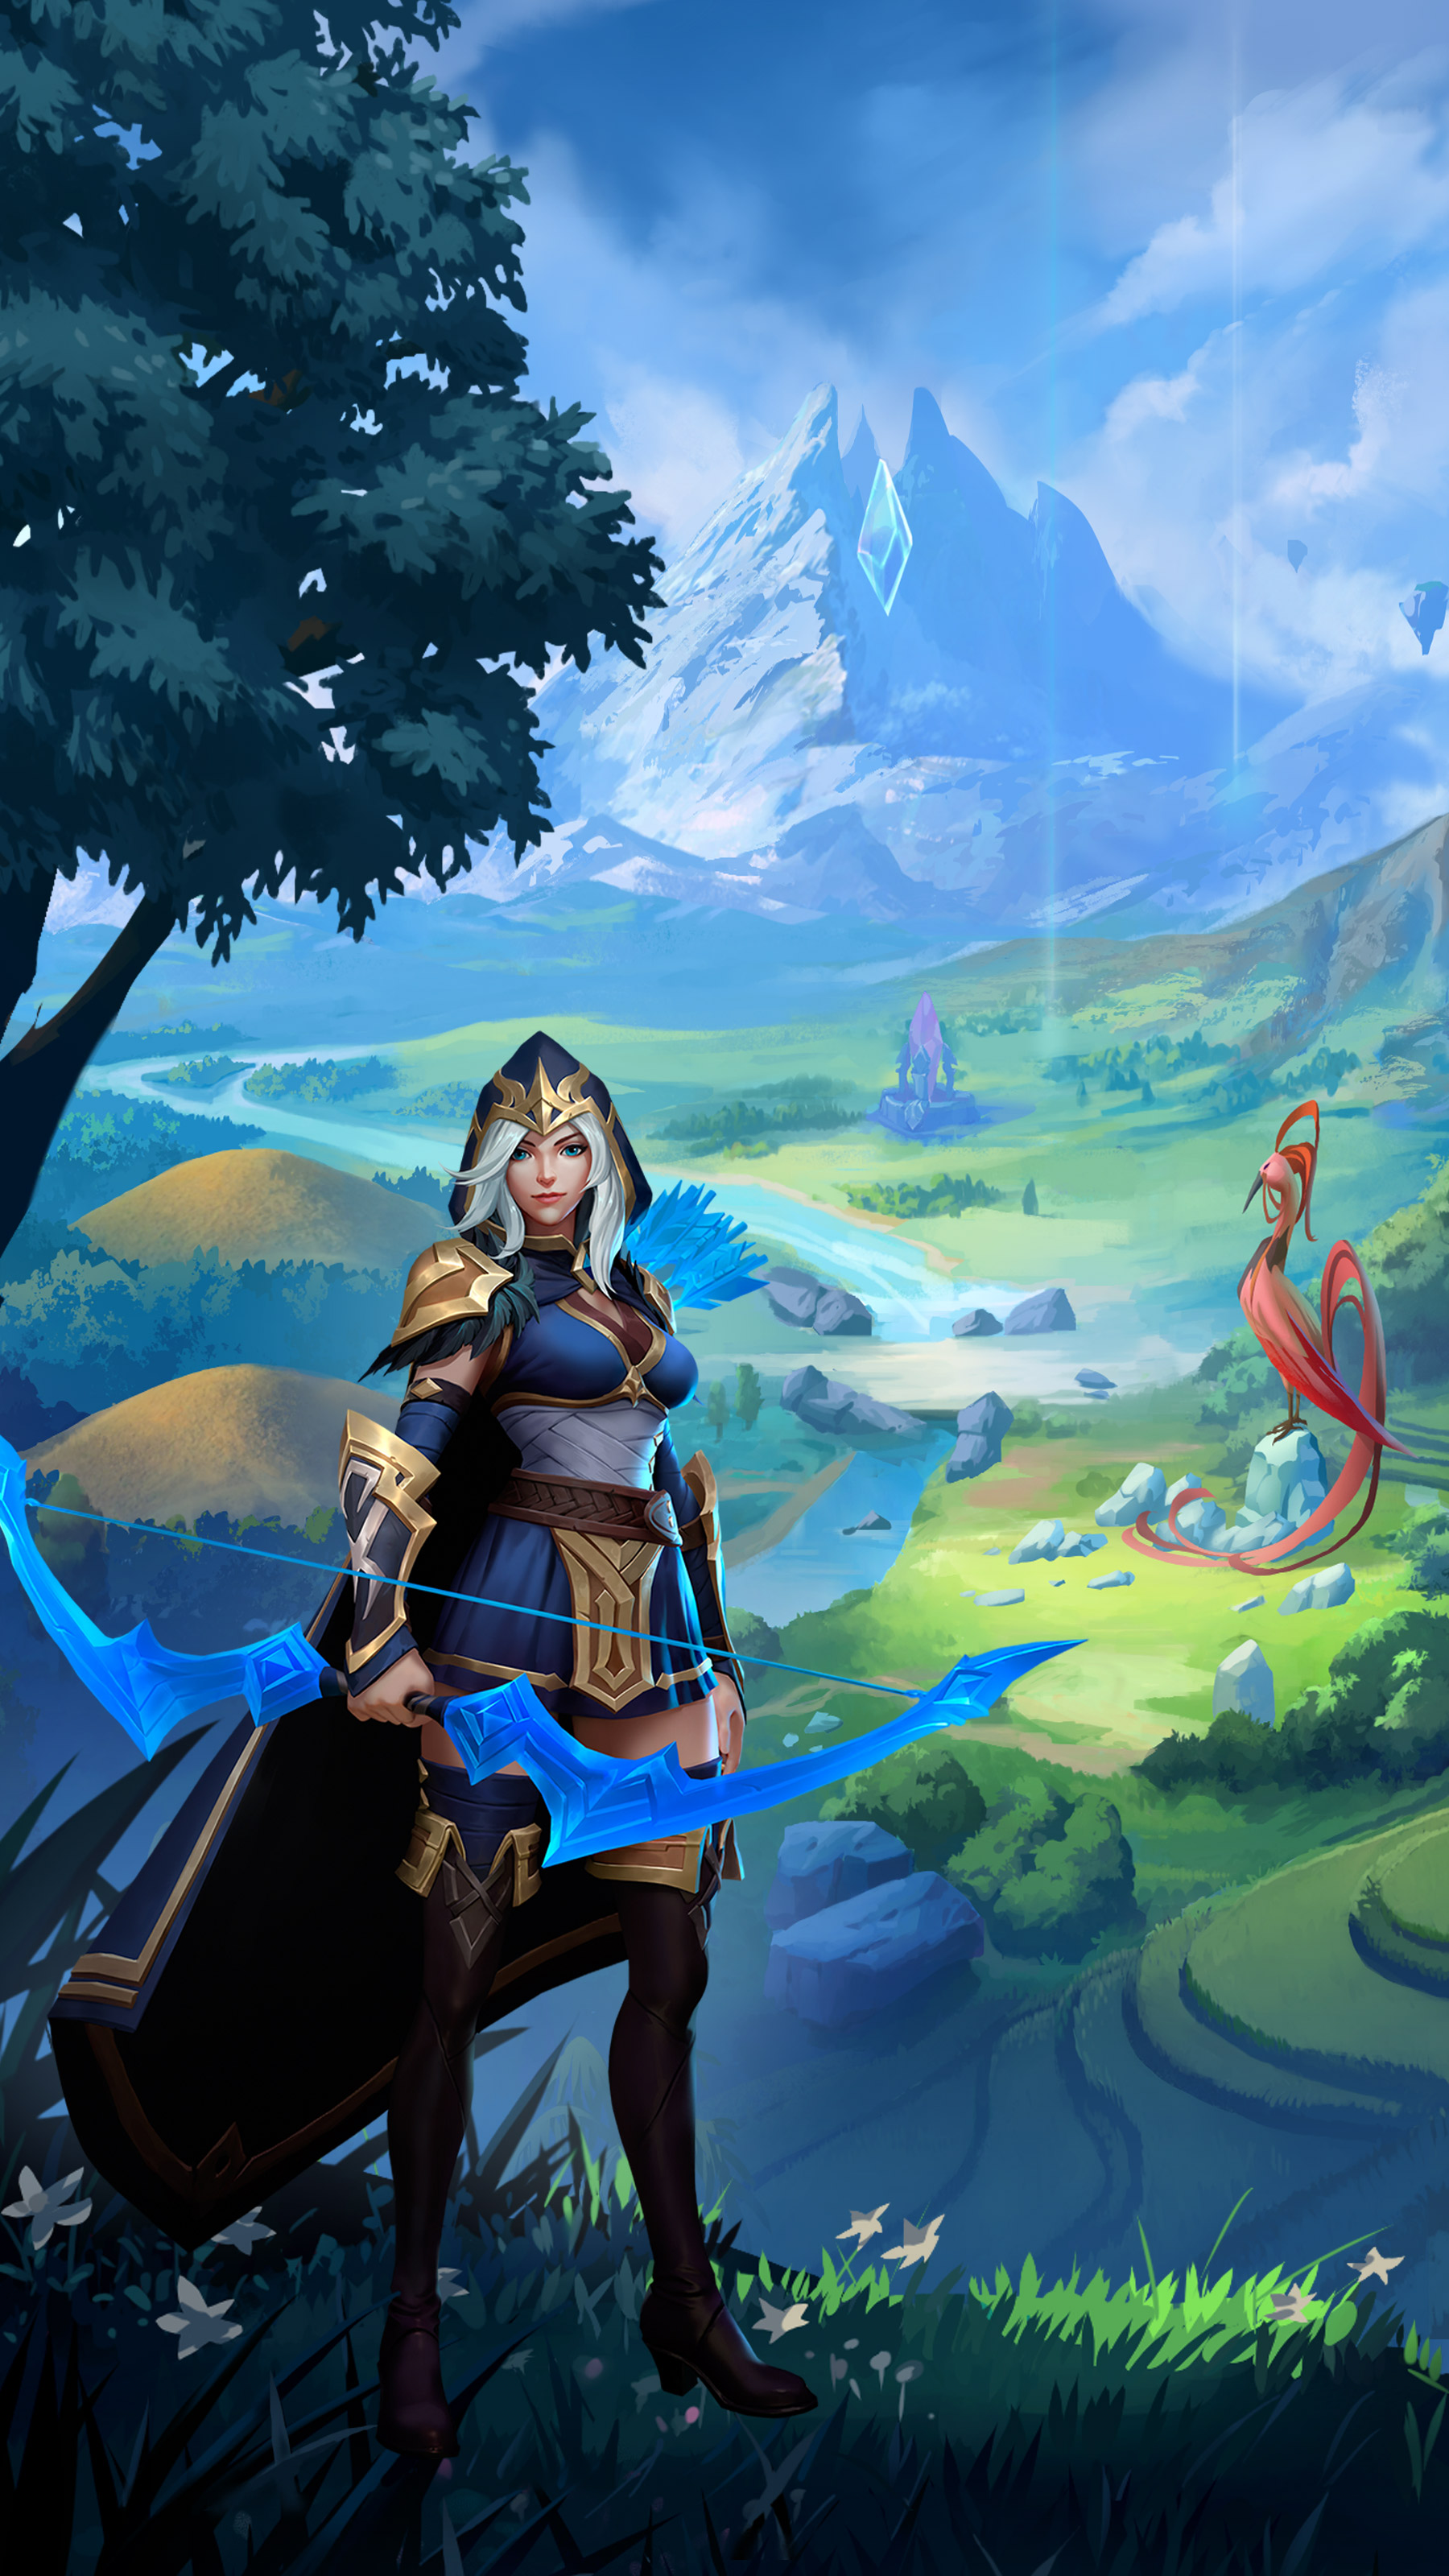 wallpaper keren league of legends: wild rift atau LOL